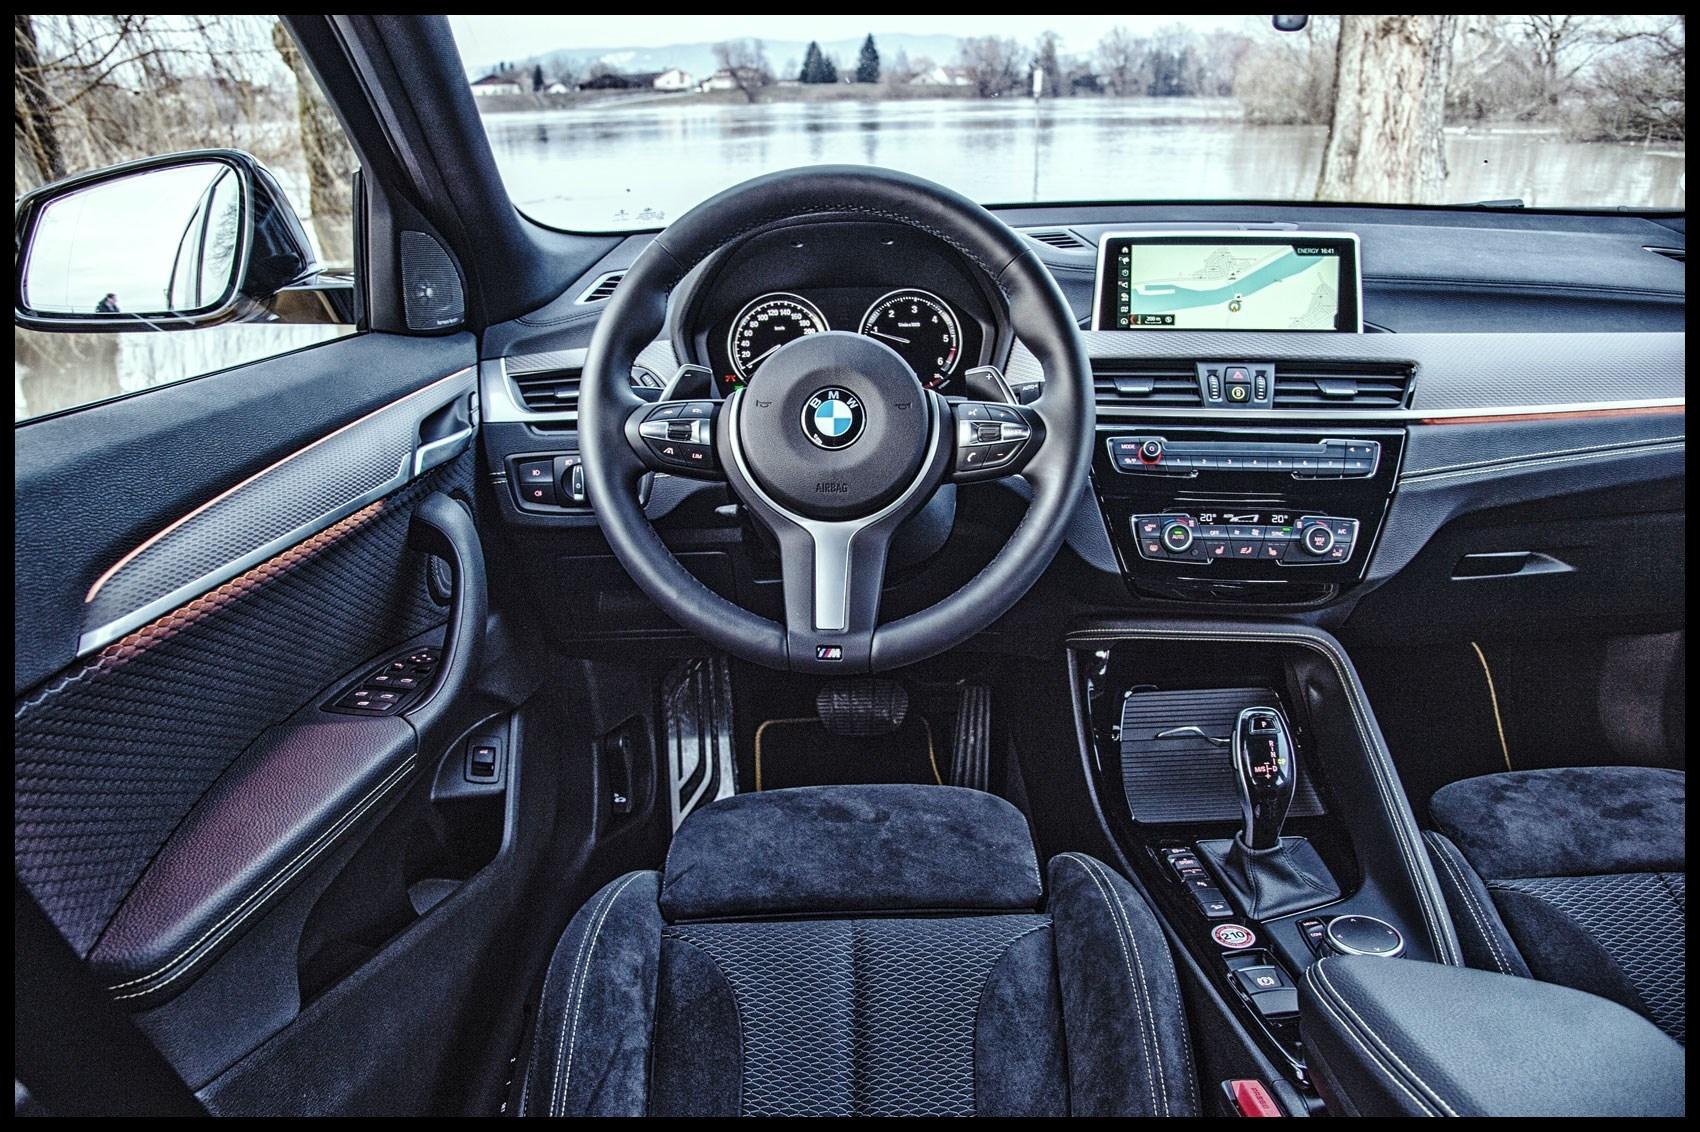 BMW X2 vs Jaguar E Pace vs Volvo XC40 who makes the best premium